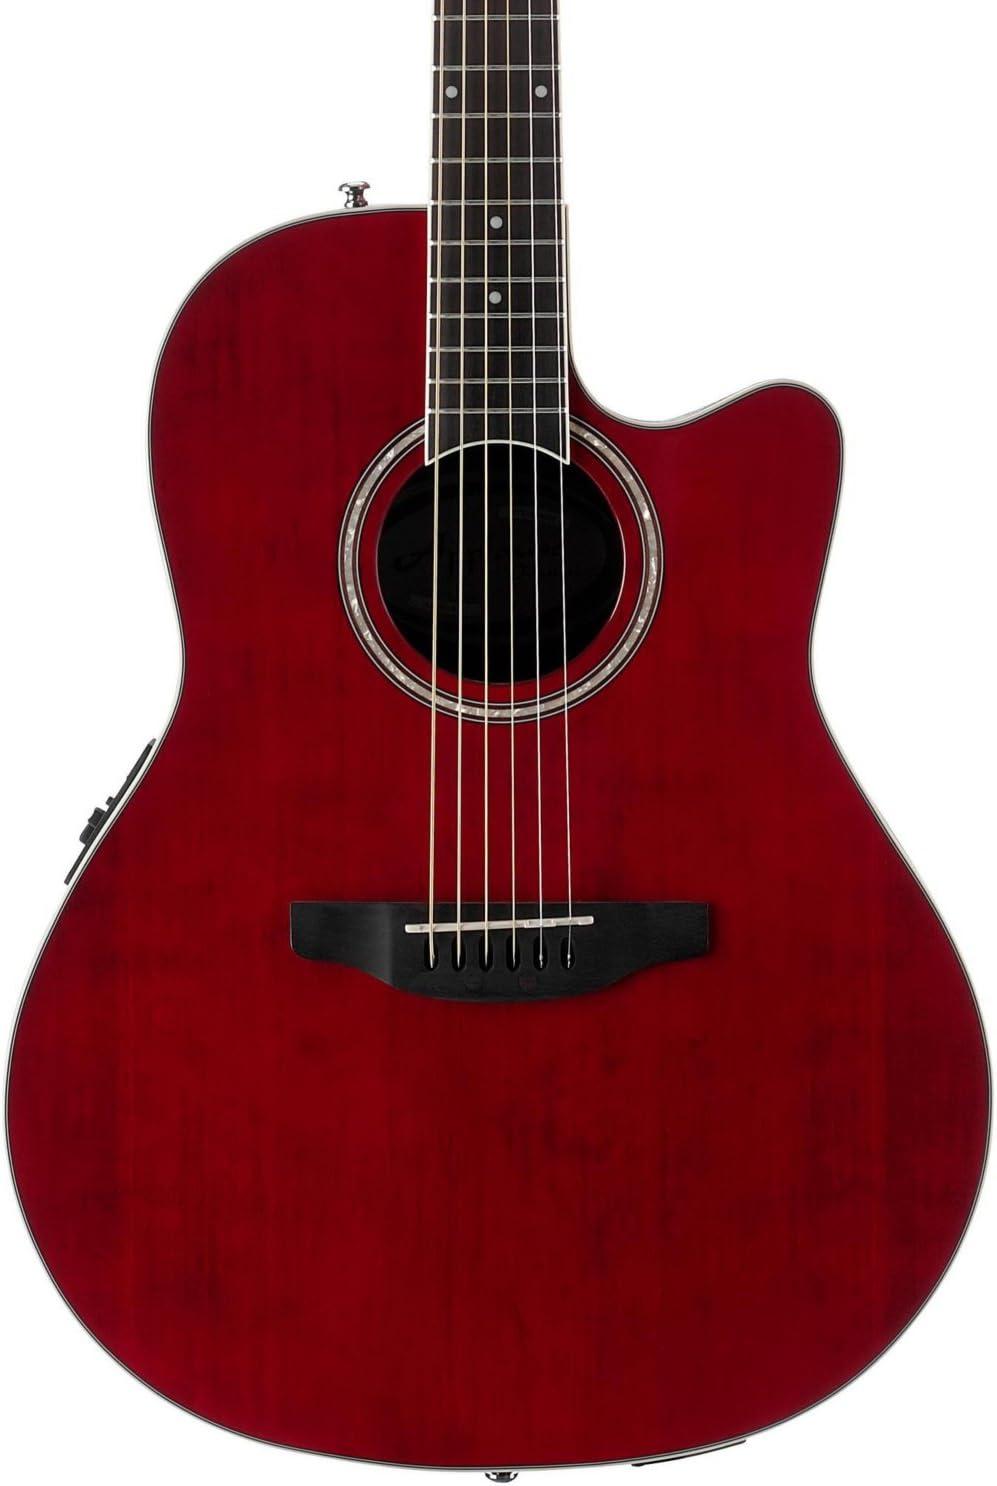 Ovation Applause Guitarra Electro-Acústica Mid Cutaway ruby red ...